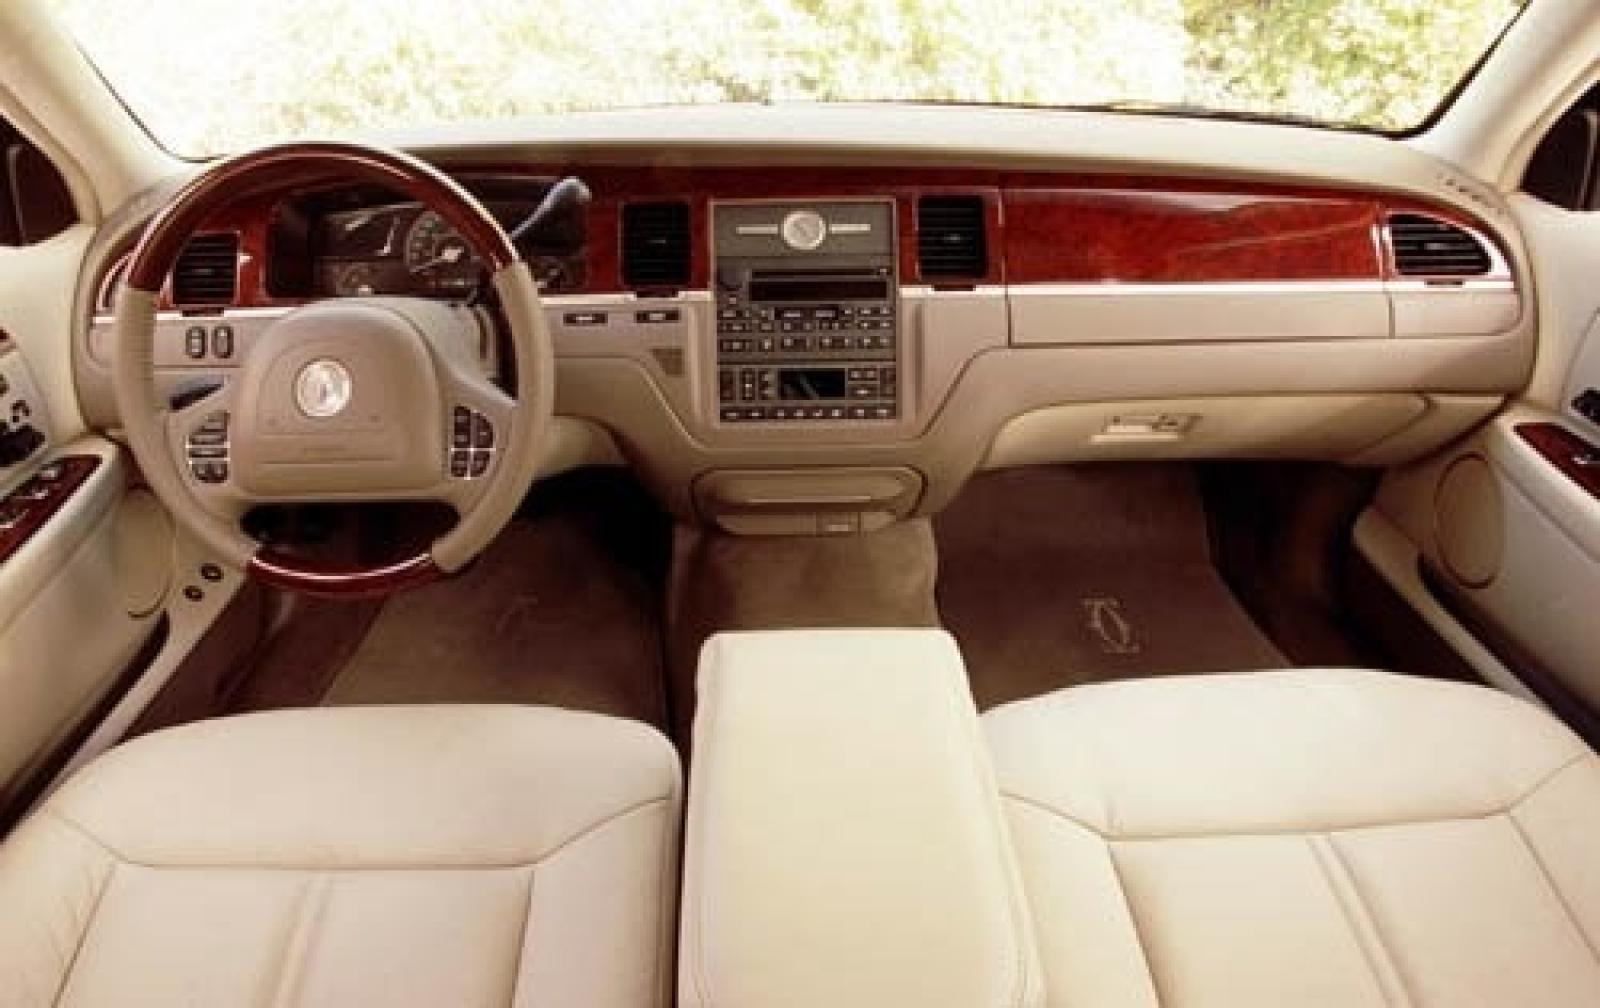 2004 lincoln town car 4 6 exterior 8 800 1024 1280 1600 origin